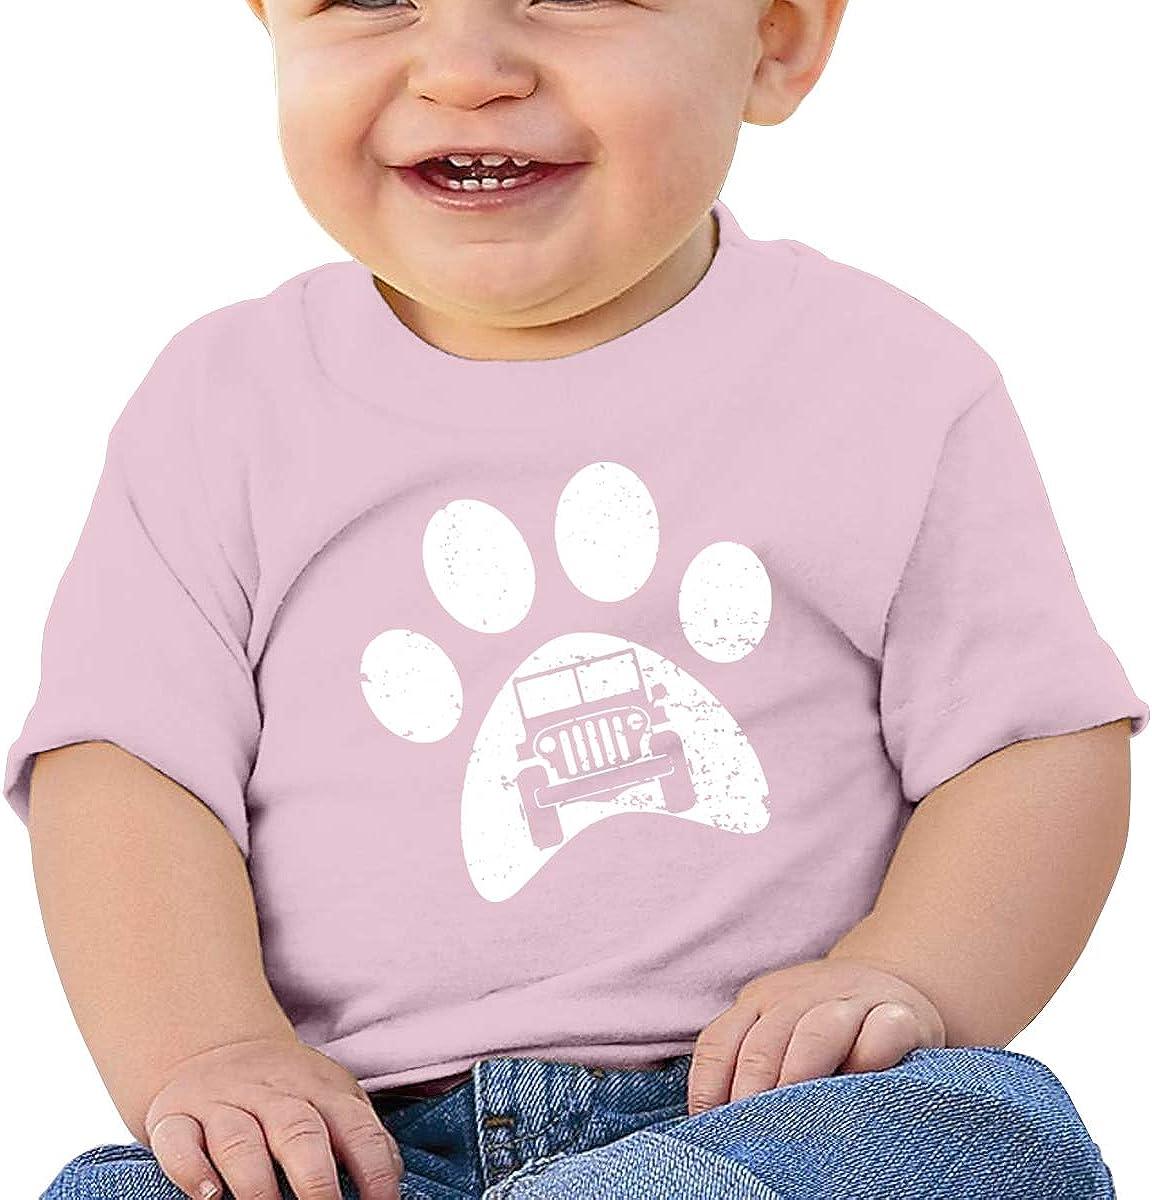 Car Dog PAW Cotton Infant Girls Top Short Sleeve